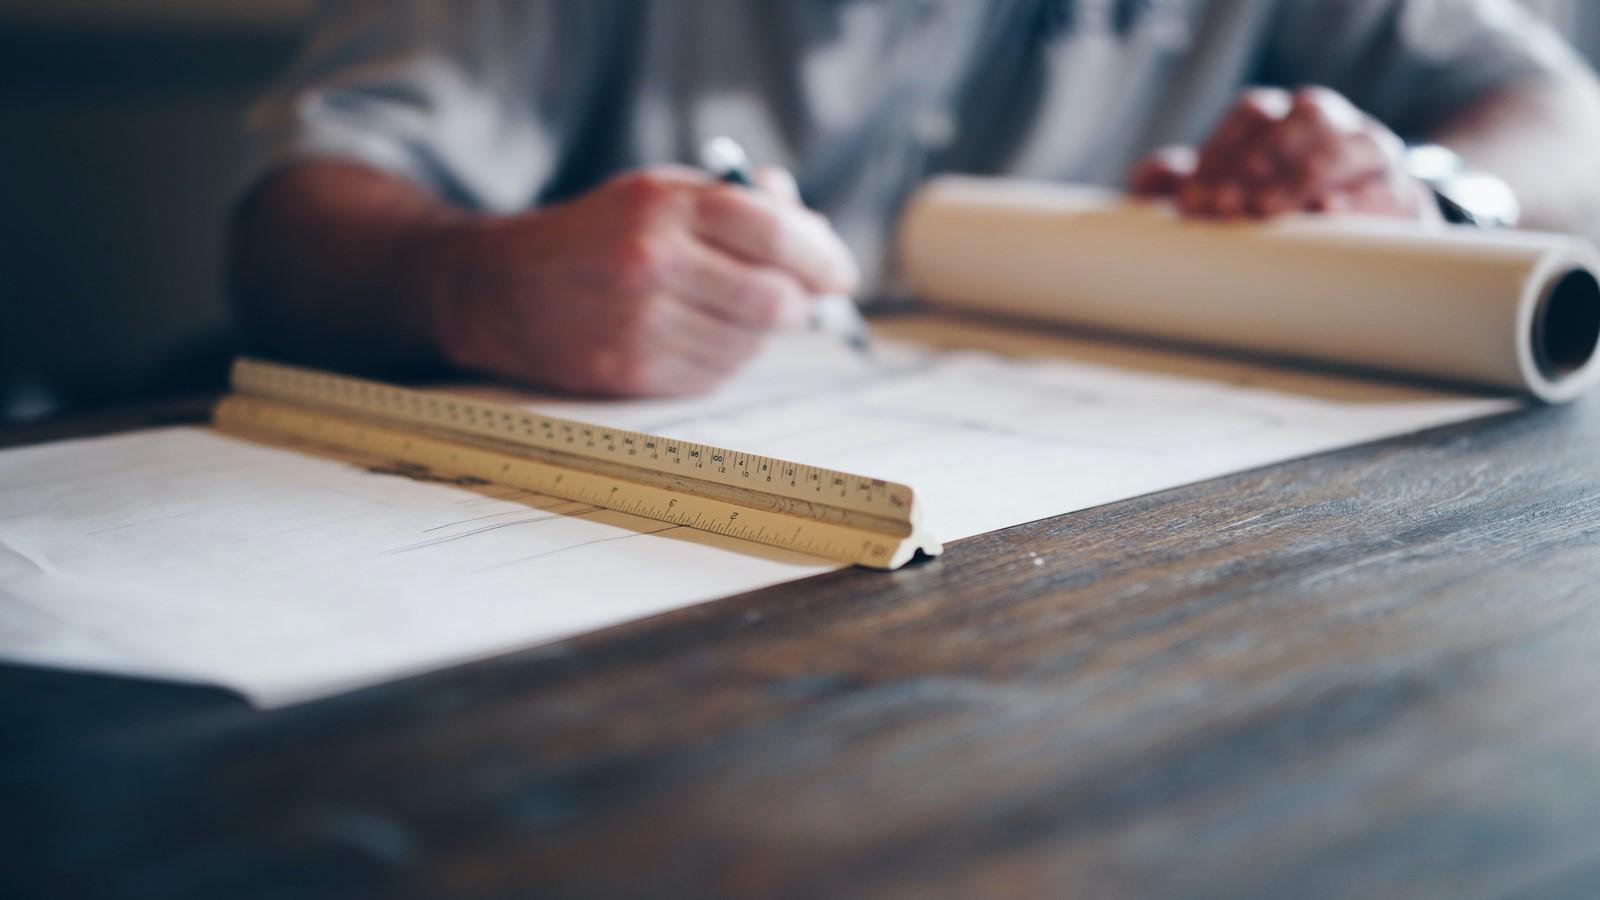 10 Characteristics that every architect has - Sheet1